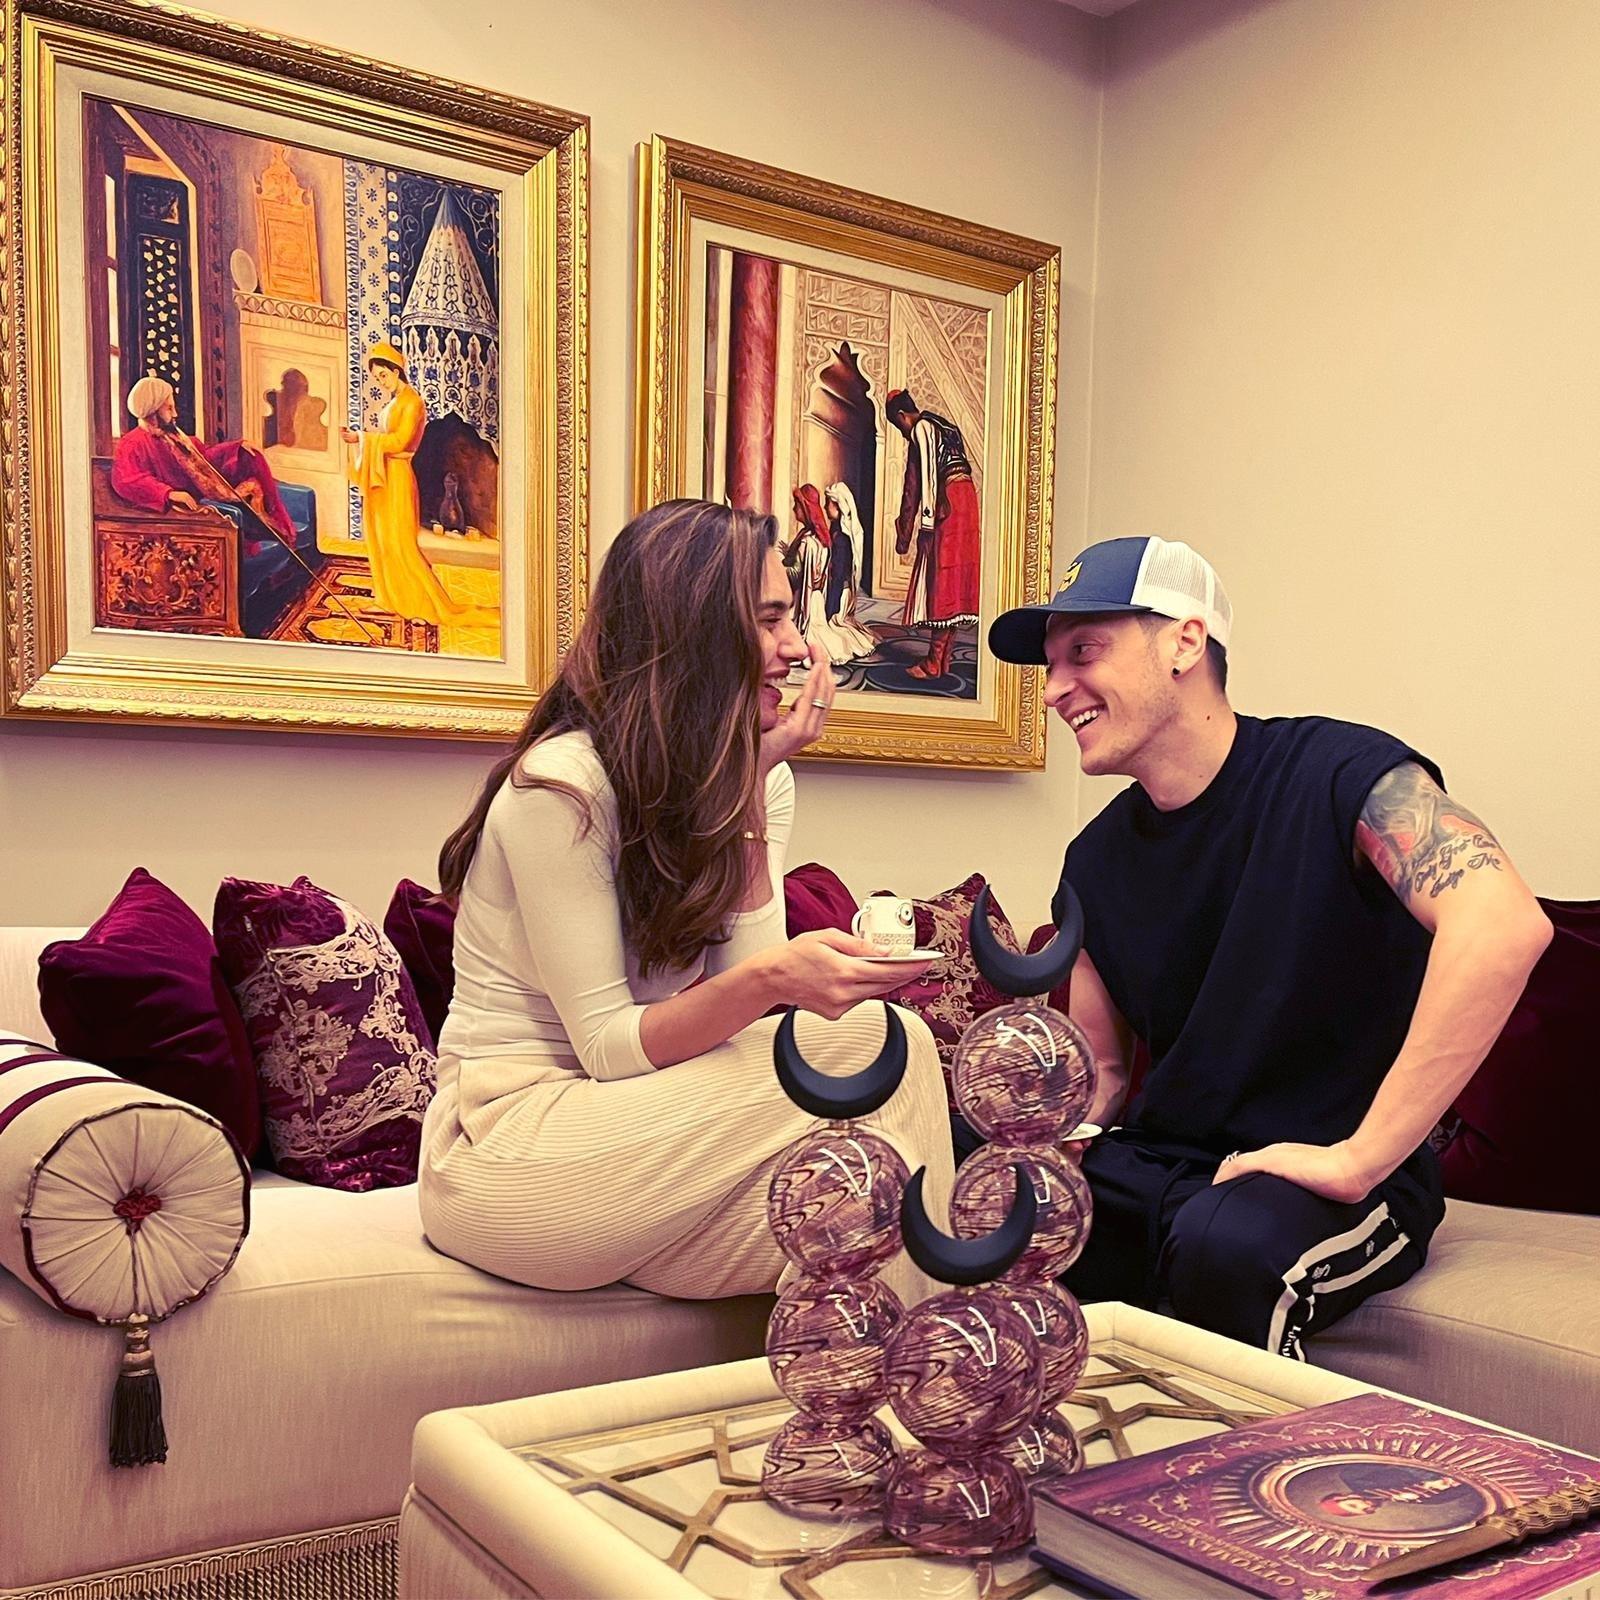 Turkish football player Mesut Özil shared a photograph of himself with his wife enjoying Turkish coffee in their London home, Jan. 10, 2021. (Twitter Photo/Mesut Özil)